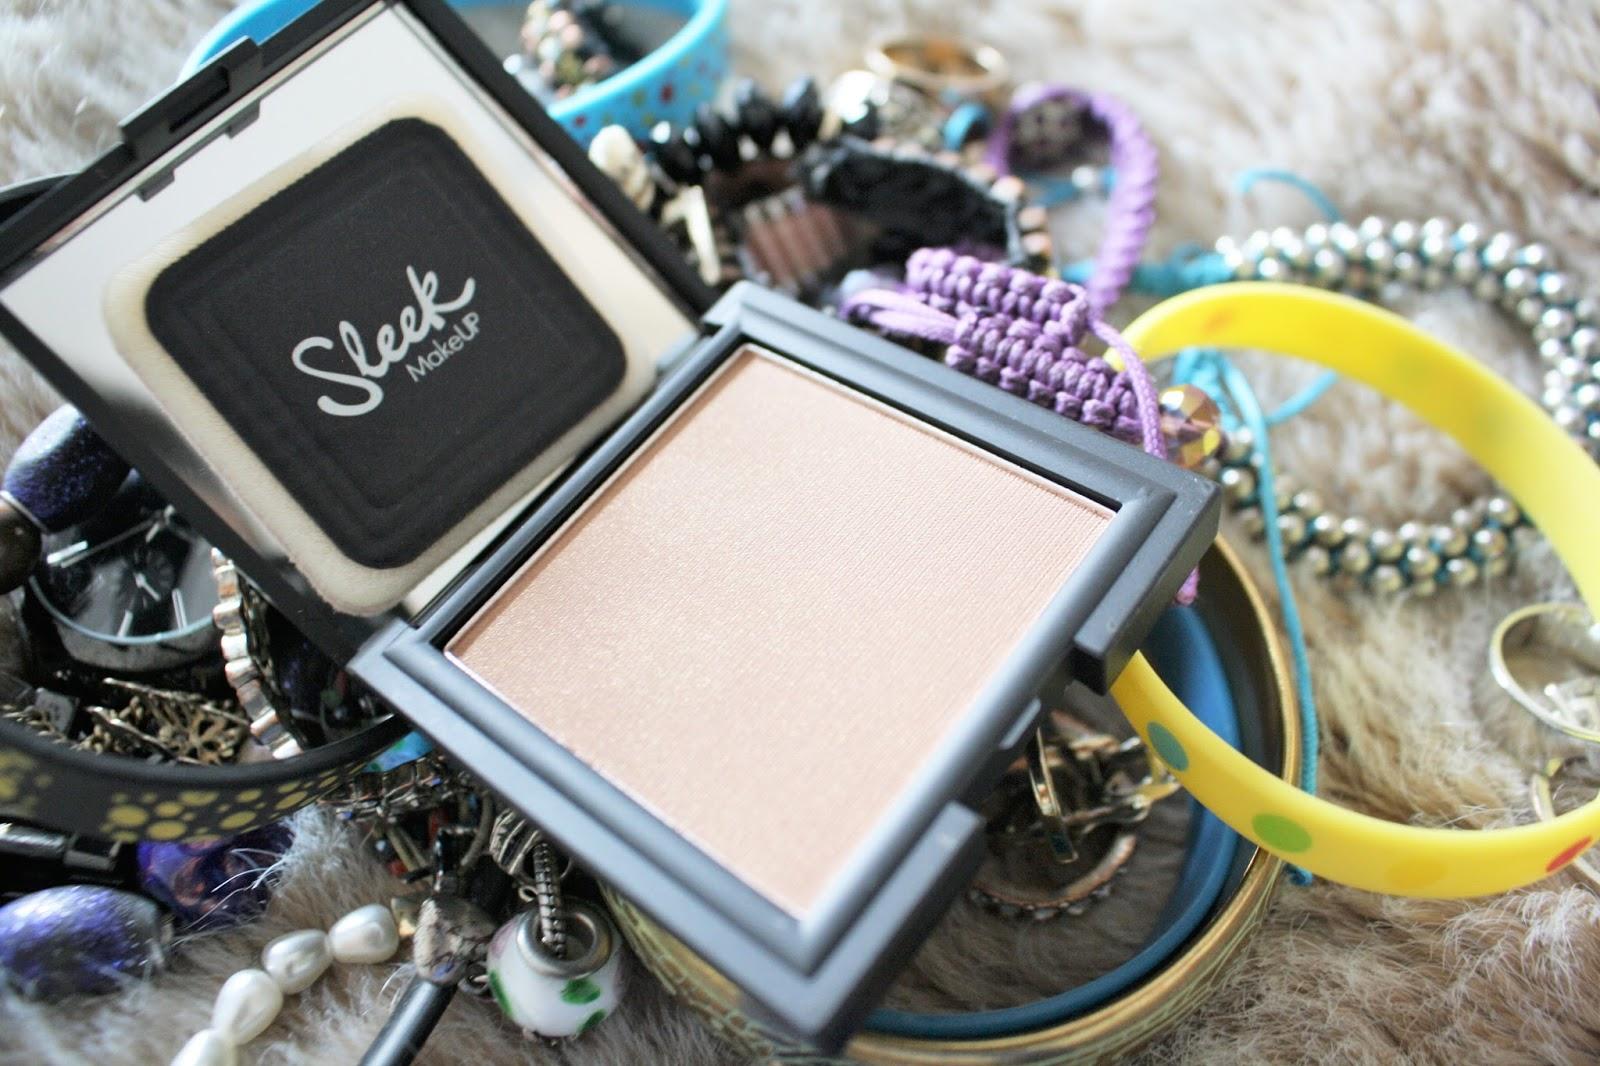 sleek make up pressed powder anika may everyday make up routine photography blog review